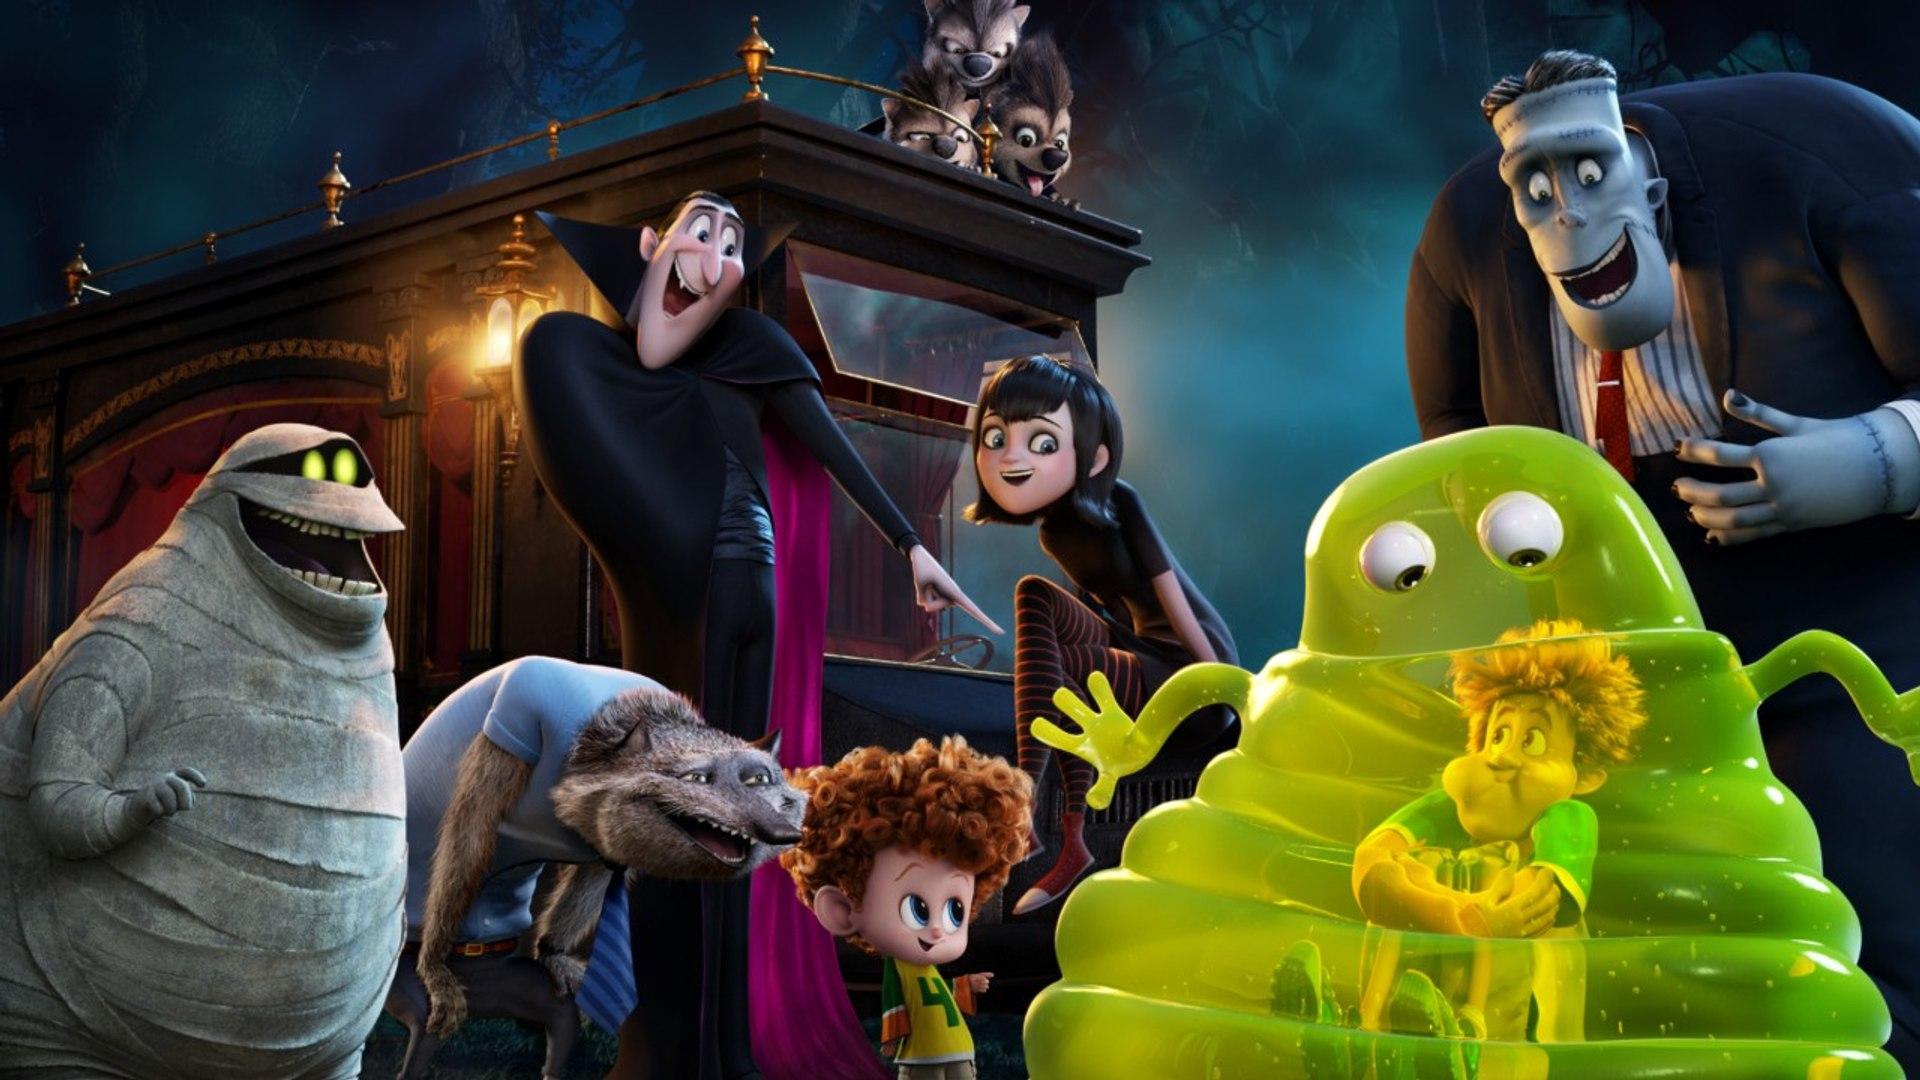 'Hotel Transylvania 4' Gets Release Date